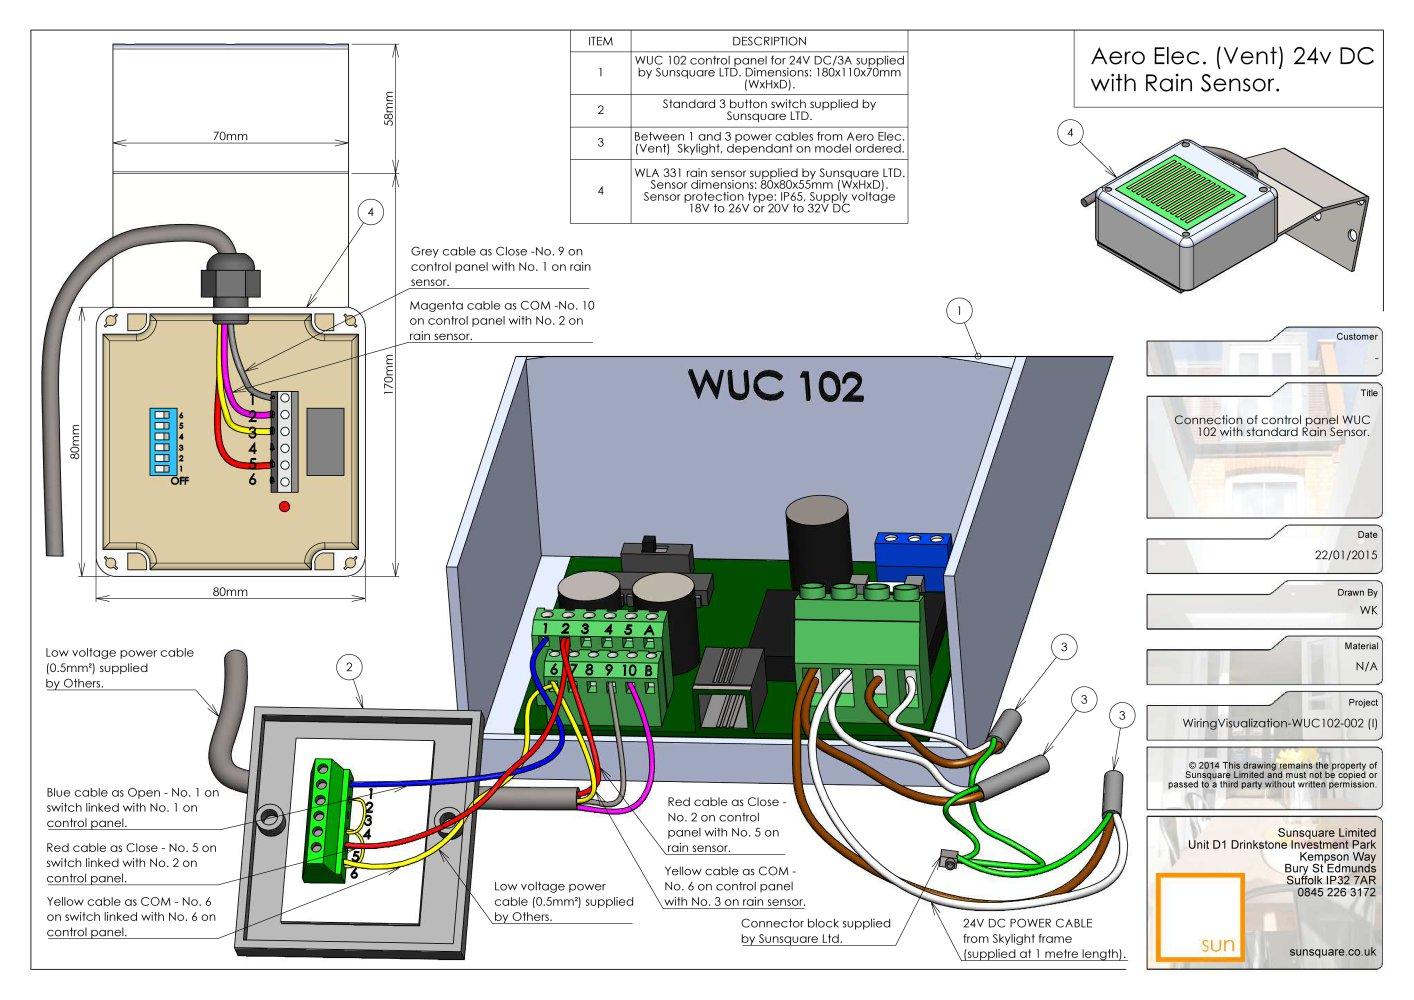 aero elecwiring diag vent 24v dc rain sensor 265076_1b aero elec wiring diag vent 24v dc rain sensor sunsquare limited irritrol rain sensor wiring diagram at crackthecode.co